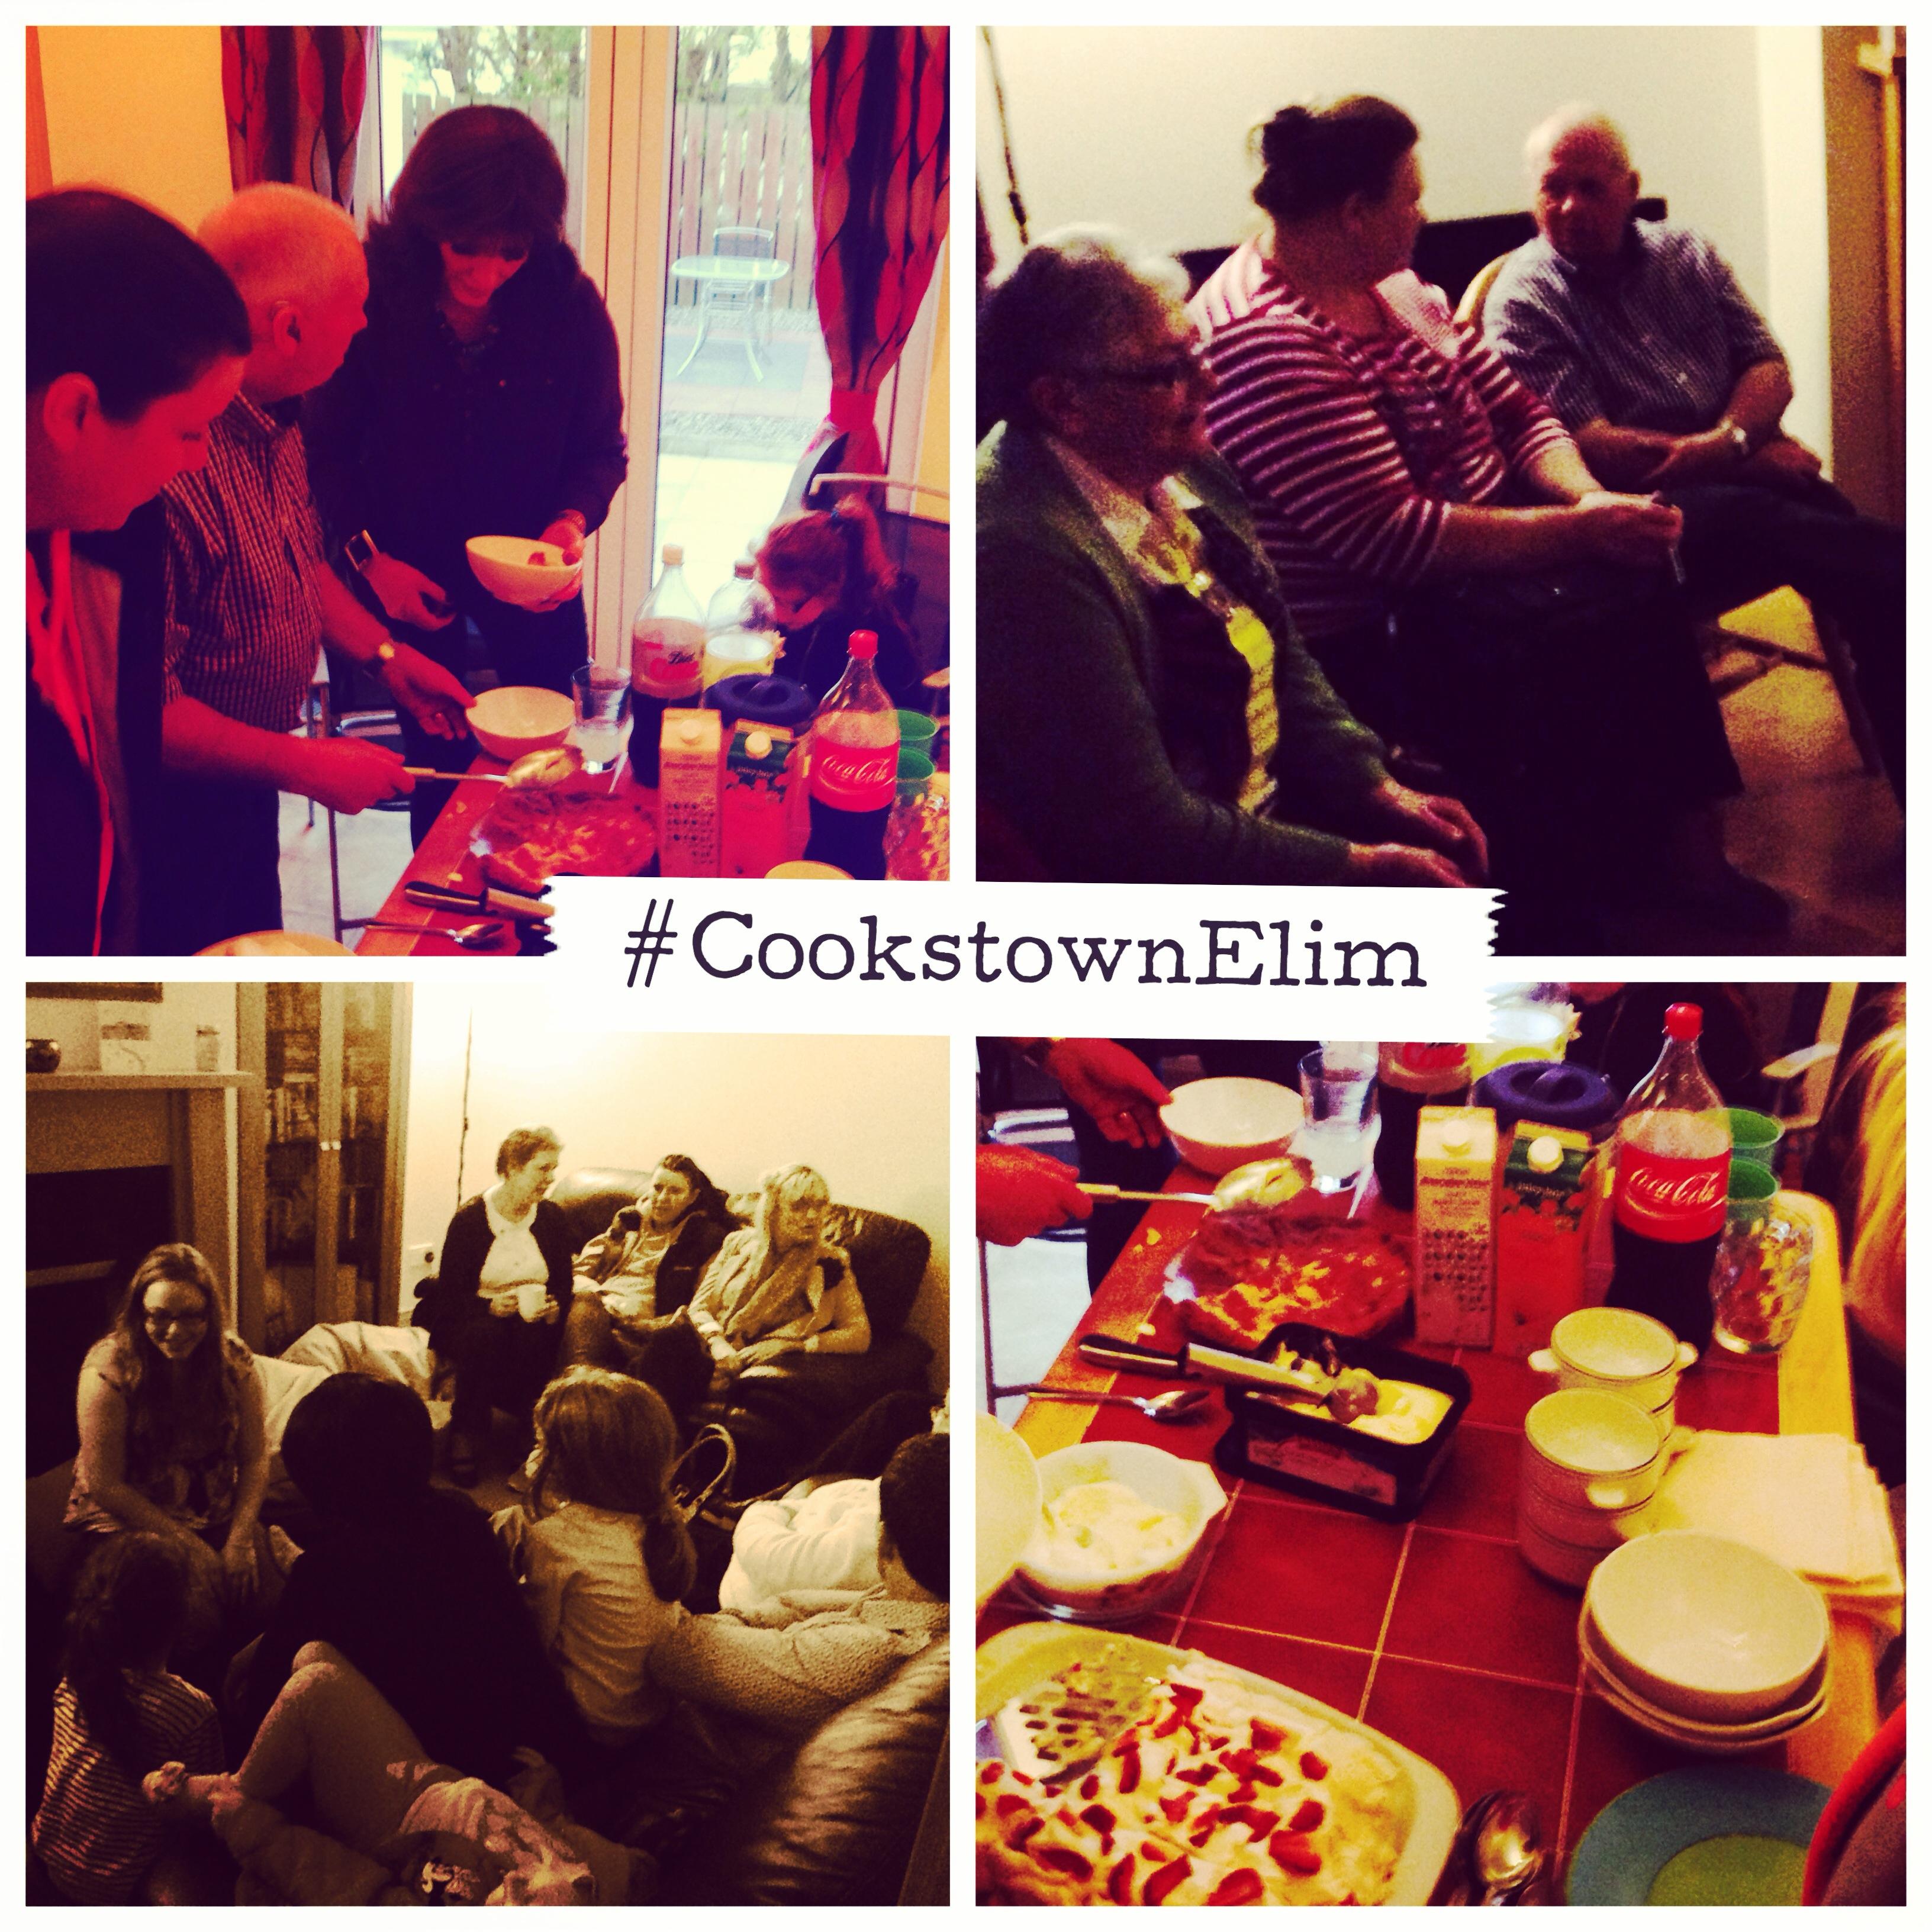 Cookstown Elim